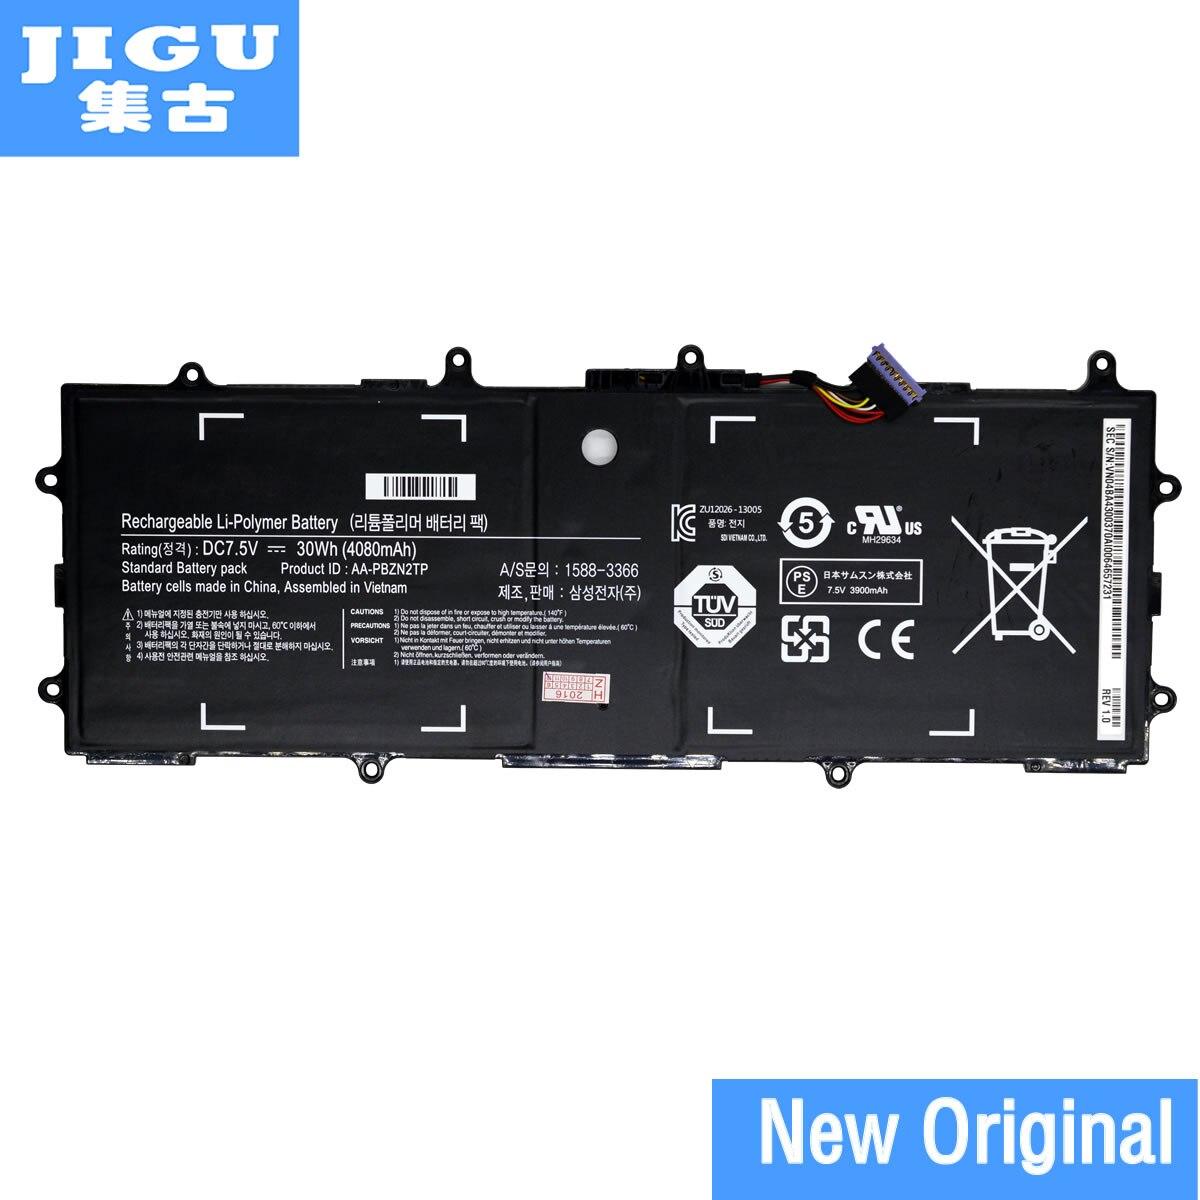 Jigu nuevo genuino AA-PBZN2TP batería para Samsung Chromebook XE500T1C 905 s 915 s 905s3g XE303 XE303C12 7.5 V 4080 Mah